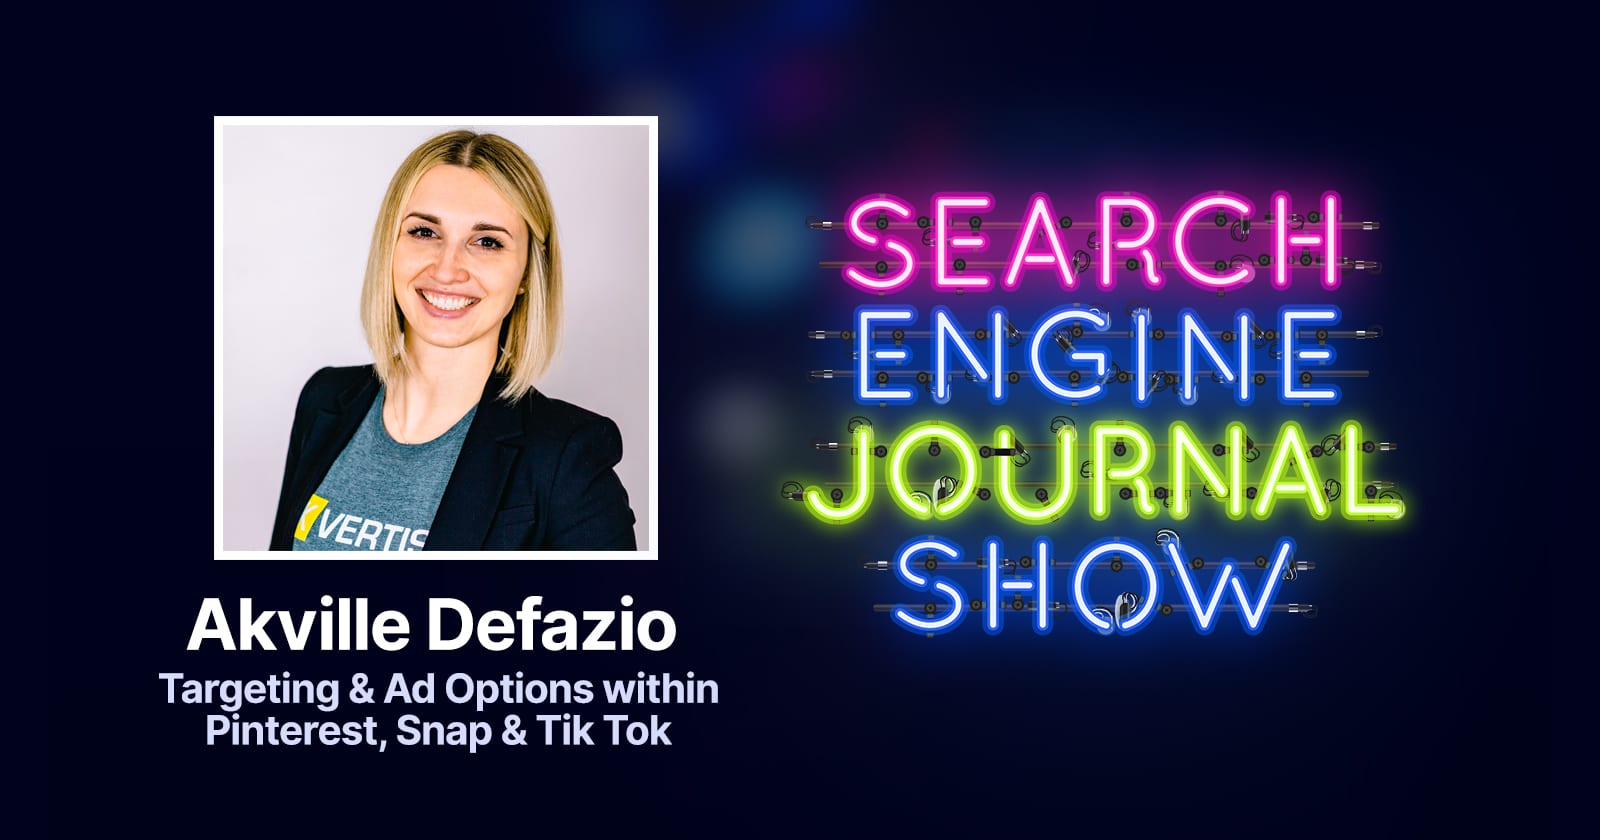 Pinterest, Snap, TikTok Targeting & Ad Options with Akville Defazio [Podcast] via @sejournal, @brentcsutoras